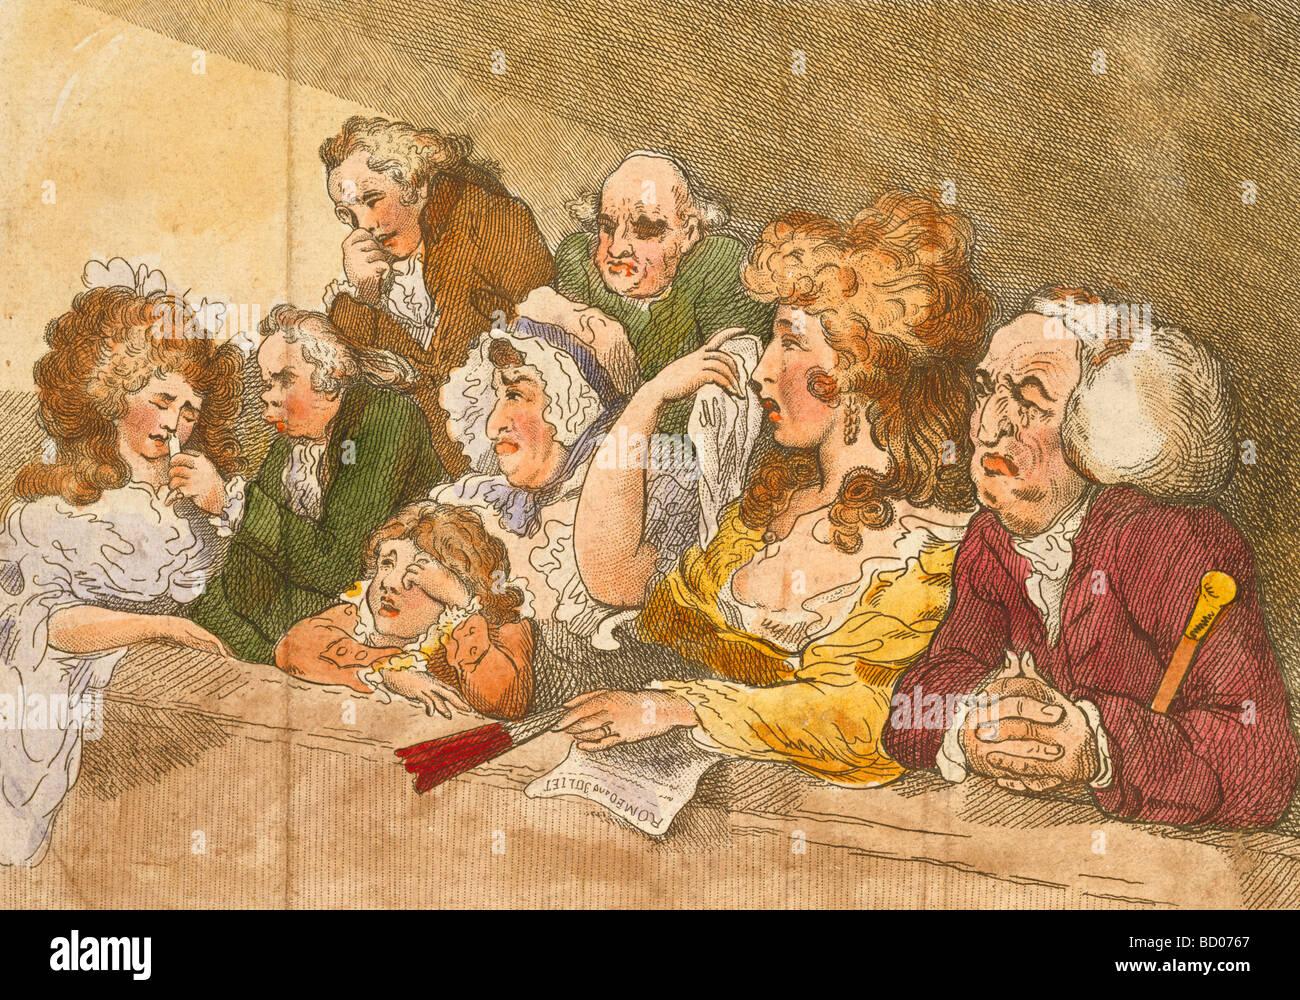 La tragedia de espectadores, de Thomas Rowlandson. Londres, Inglaterra, en 1789. Foto de stock